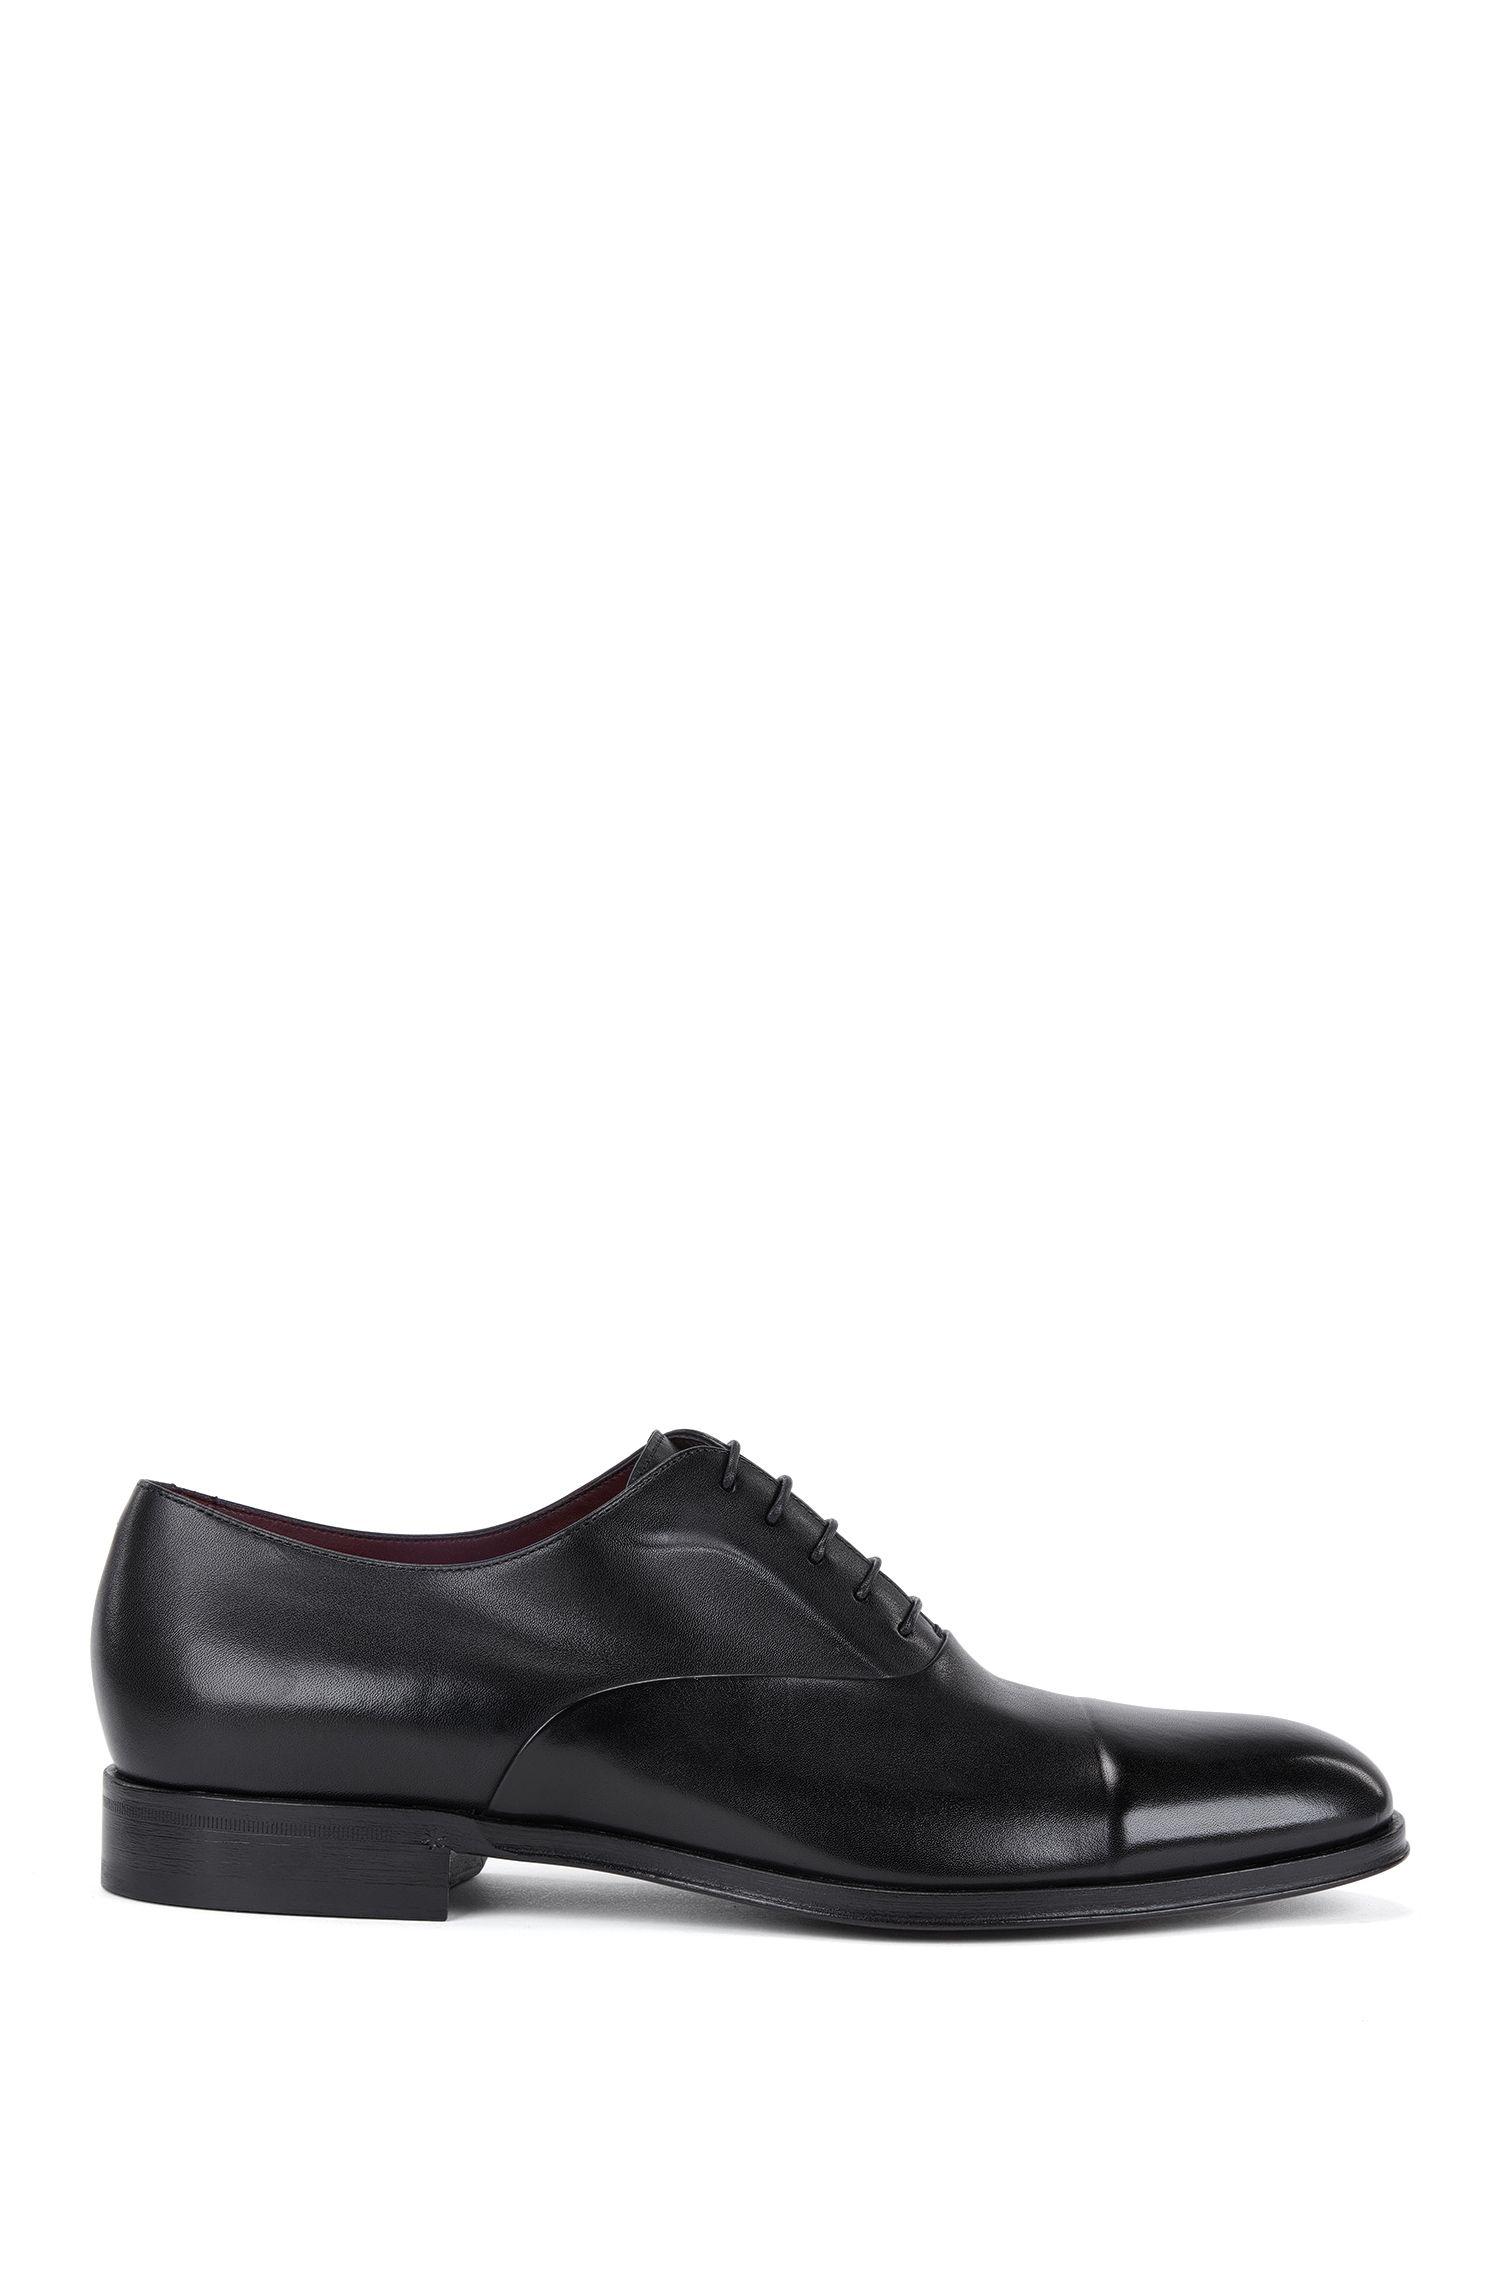 Schuhe im Oxford-Stil aus poliertem Leder